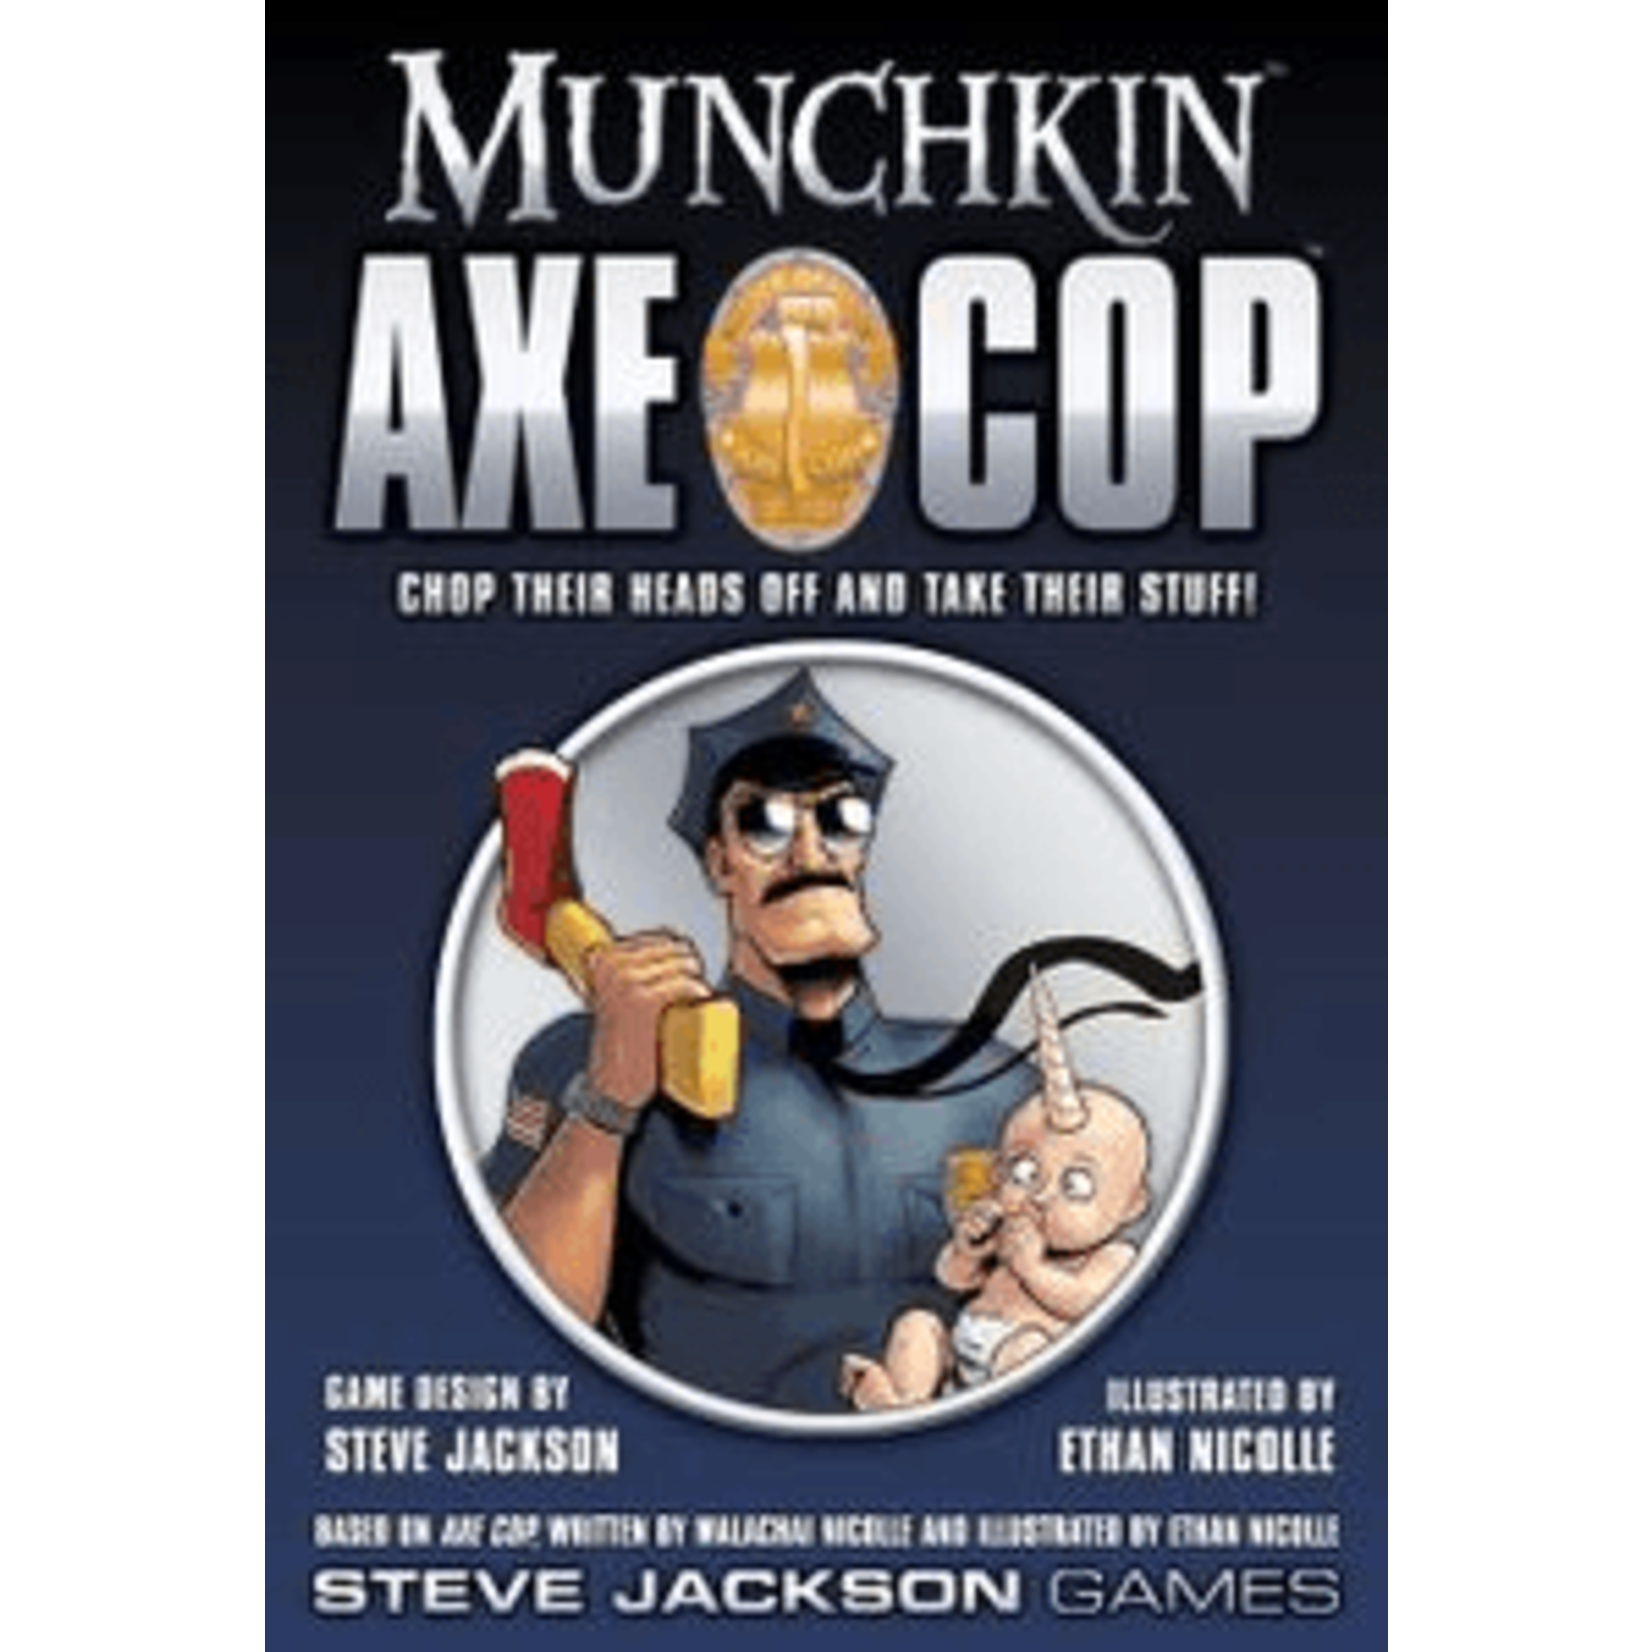 Steve Jackson Games Munchkin Axe Cop